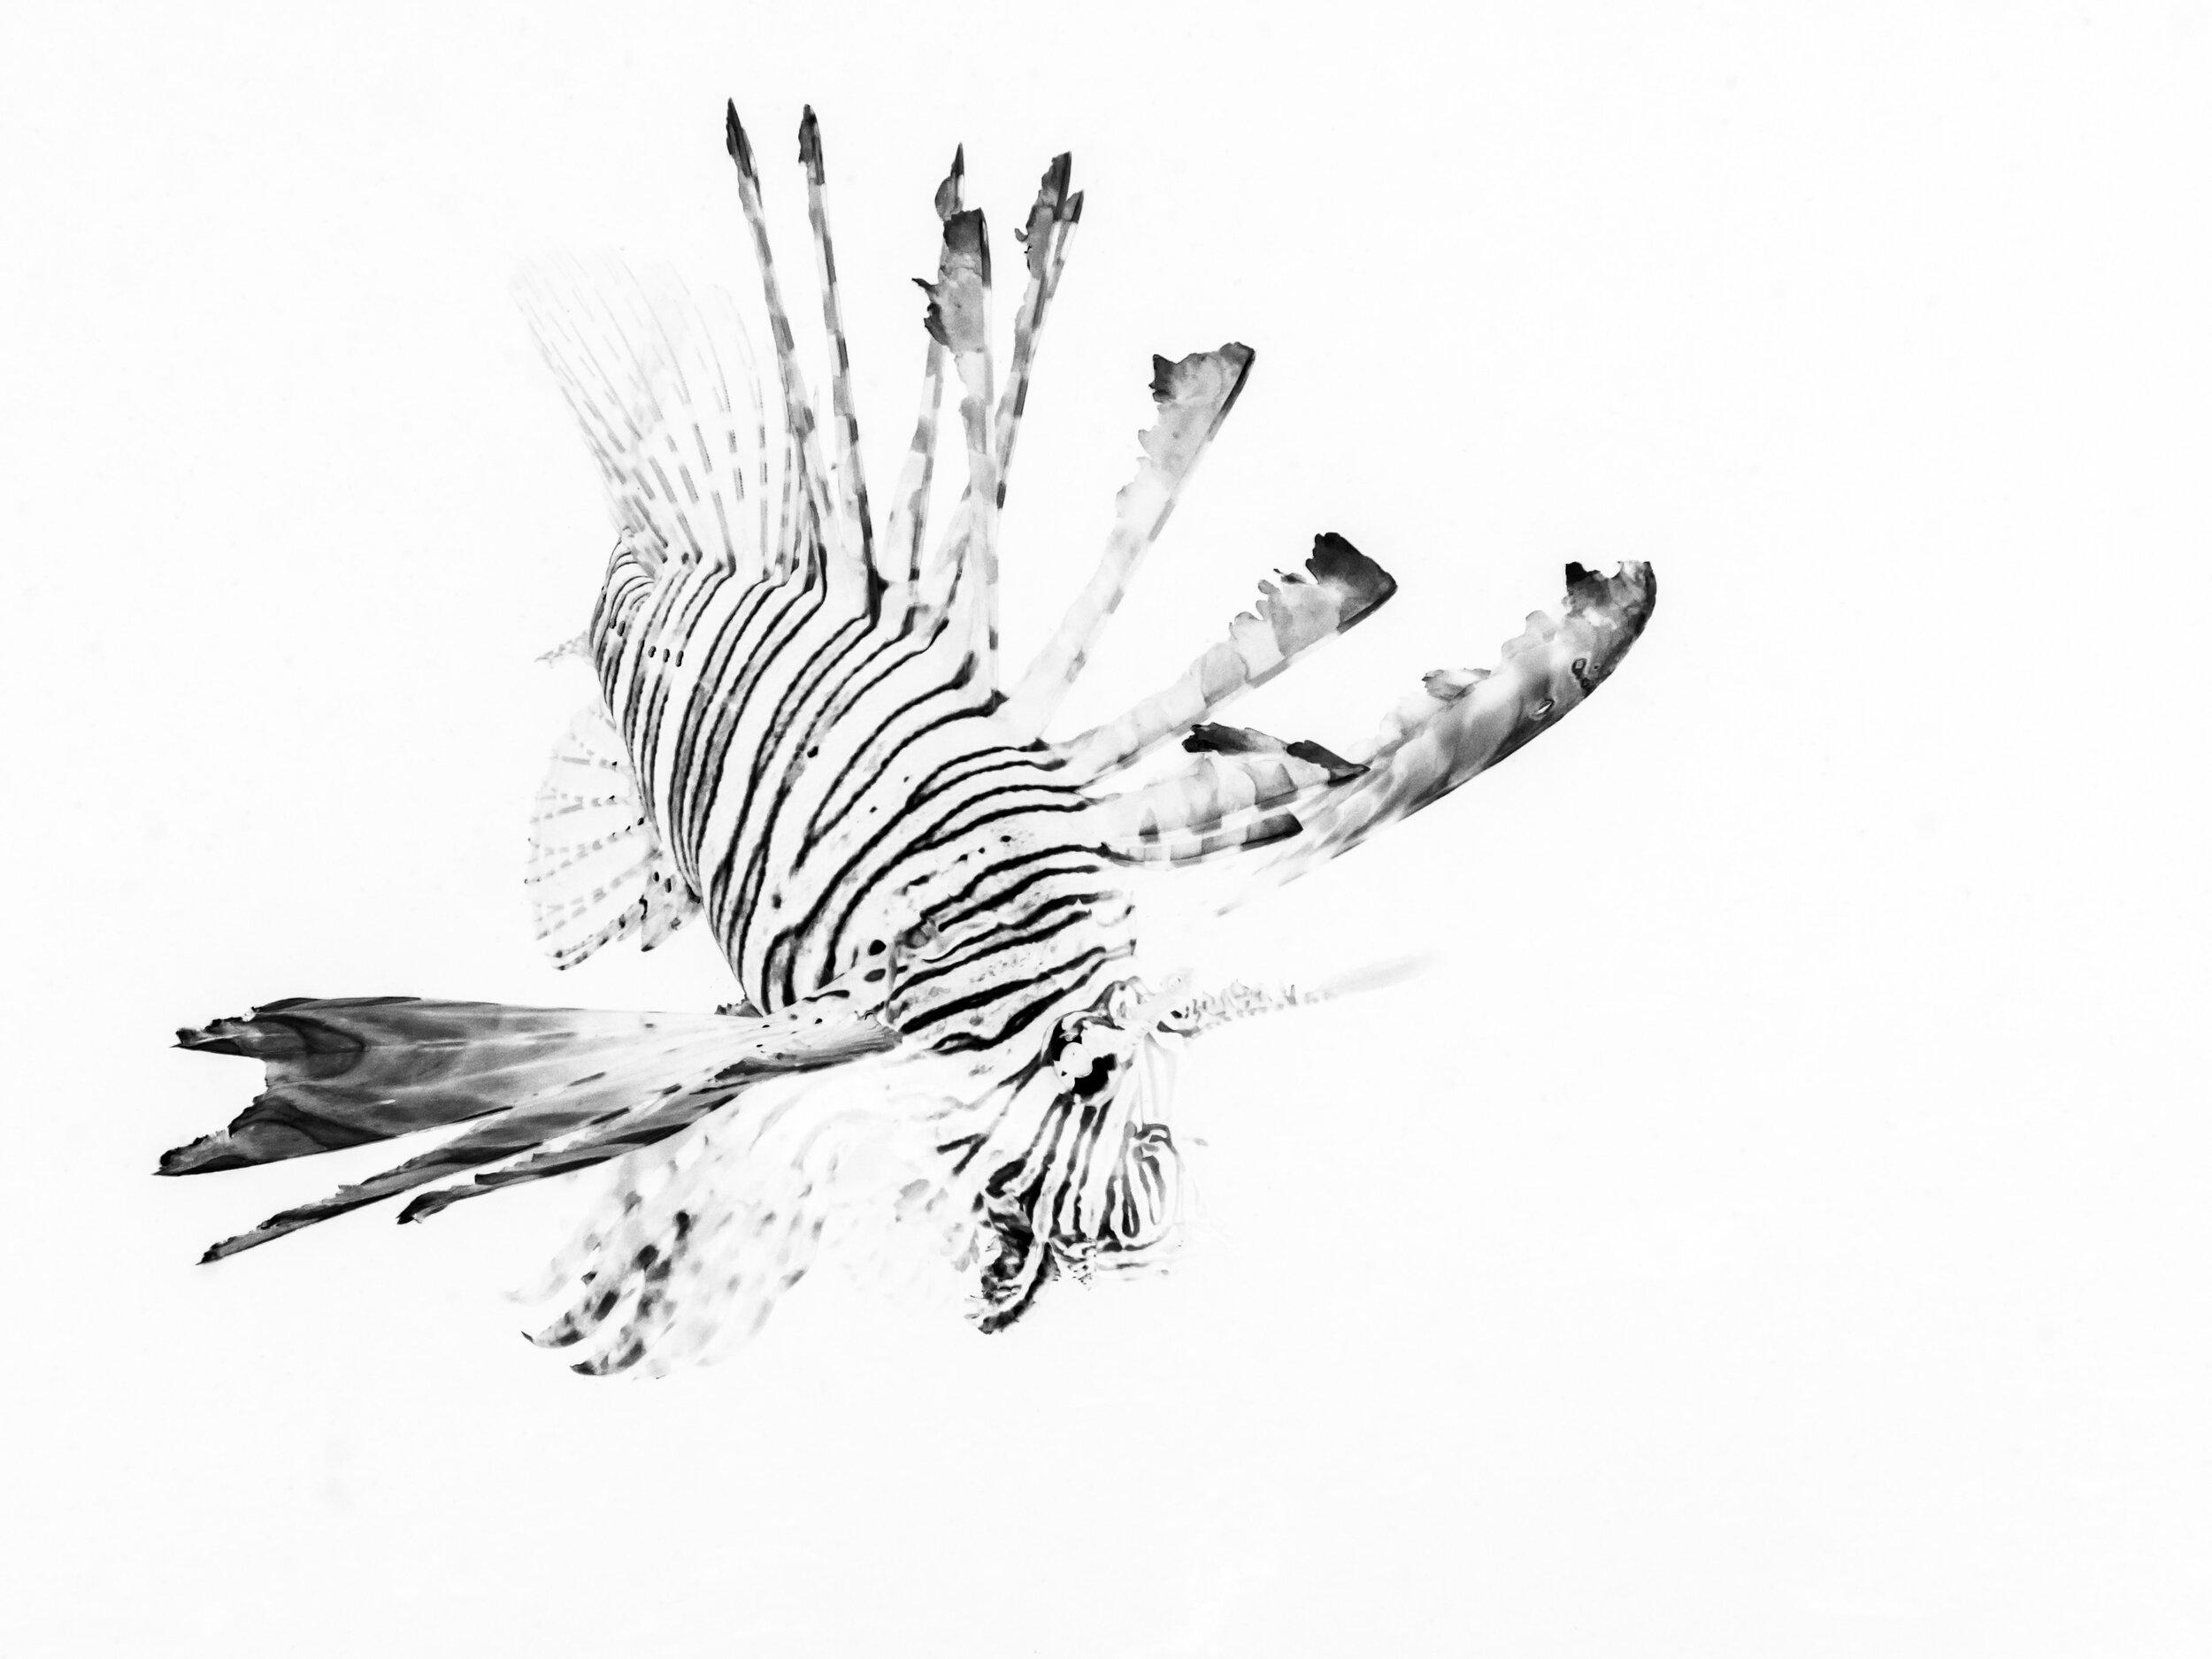 Lionfish underwater macro photography